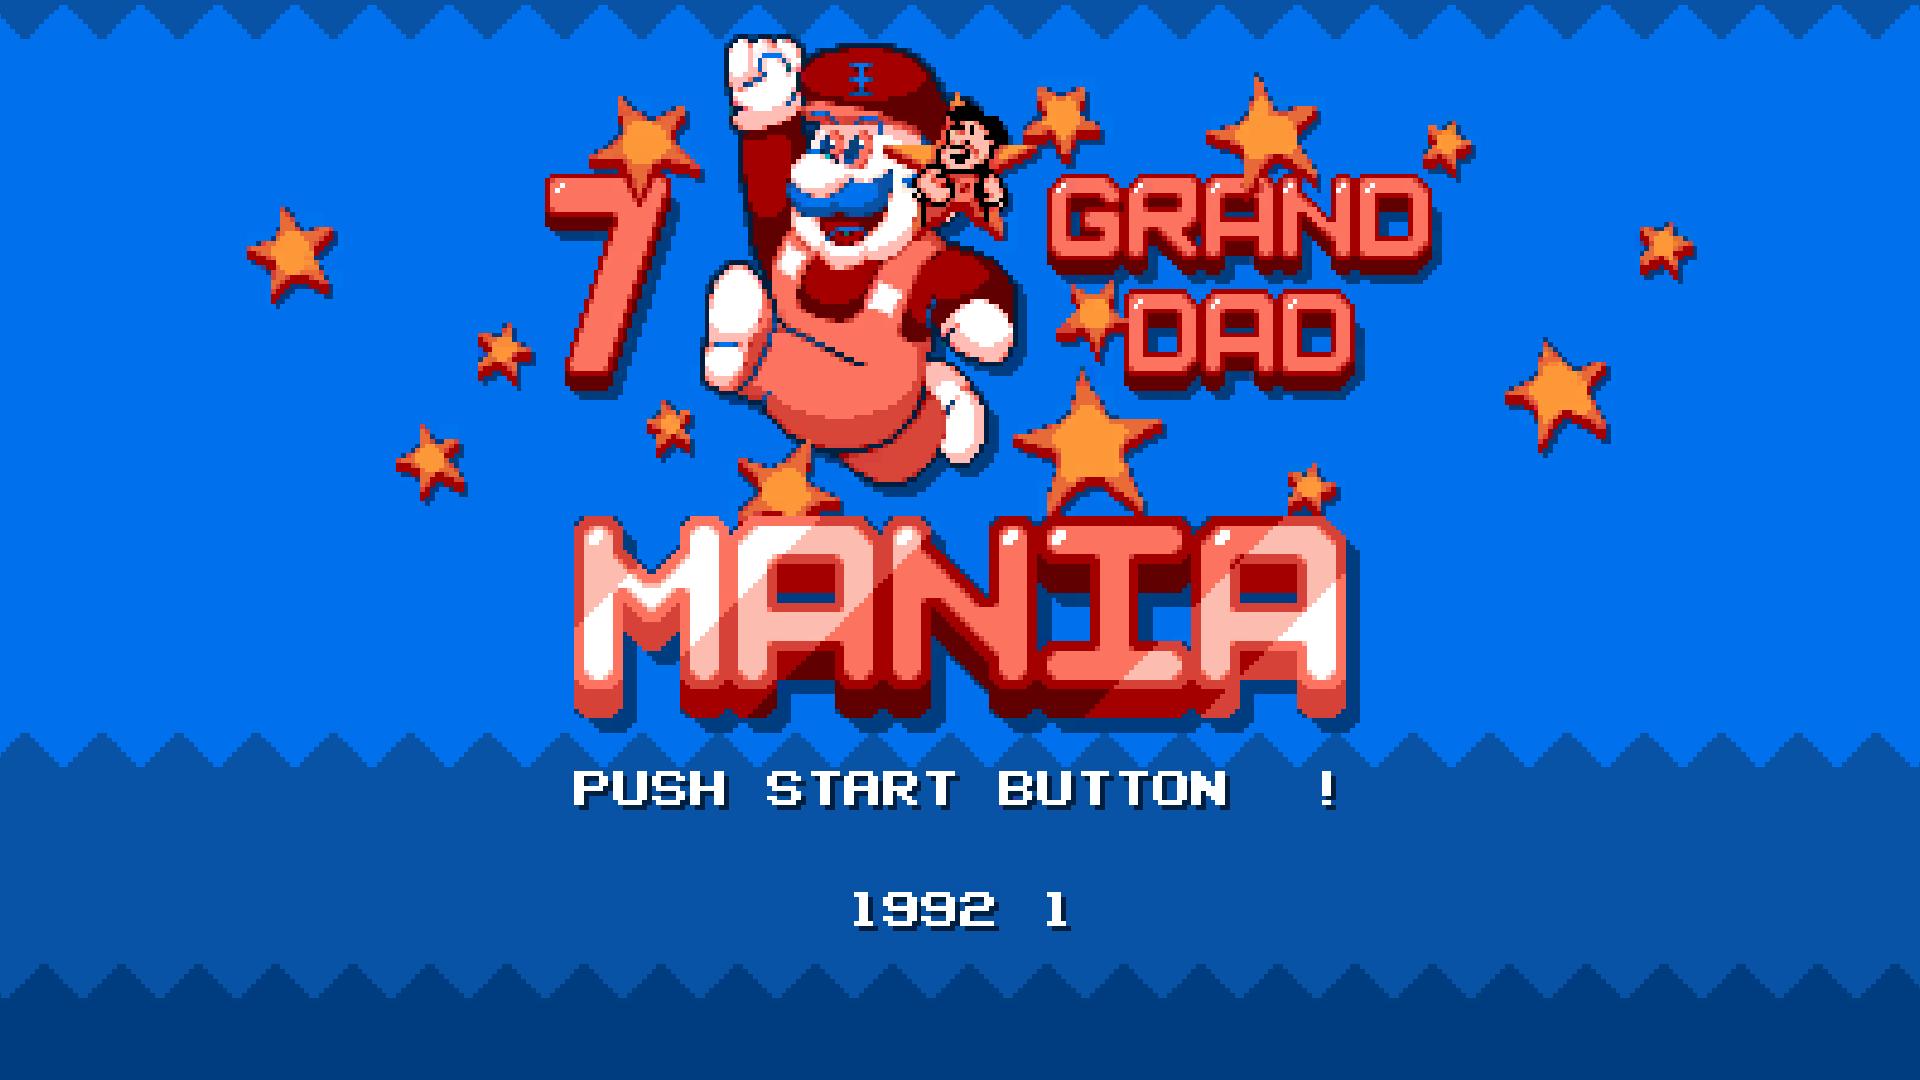 Grand Dad Mania